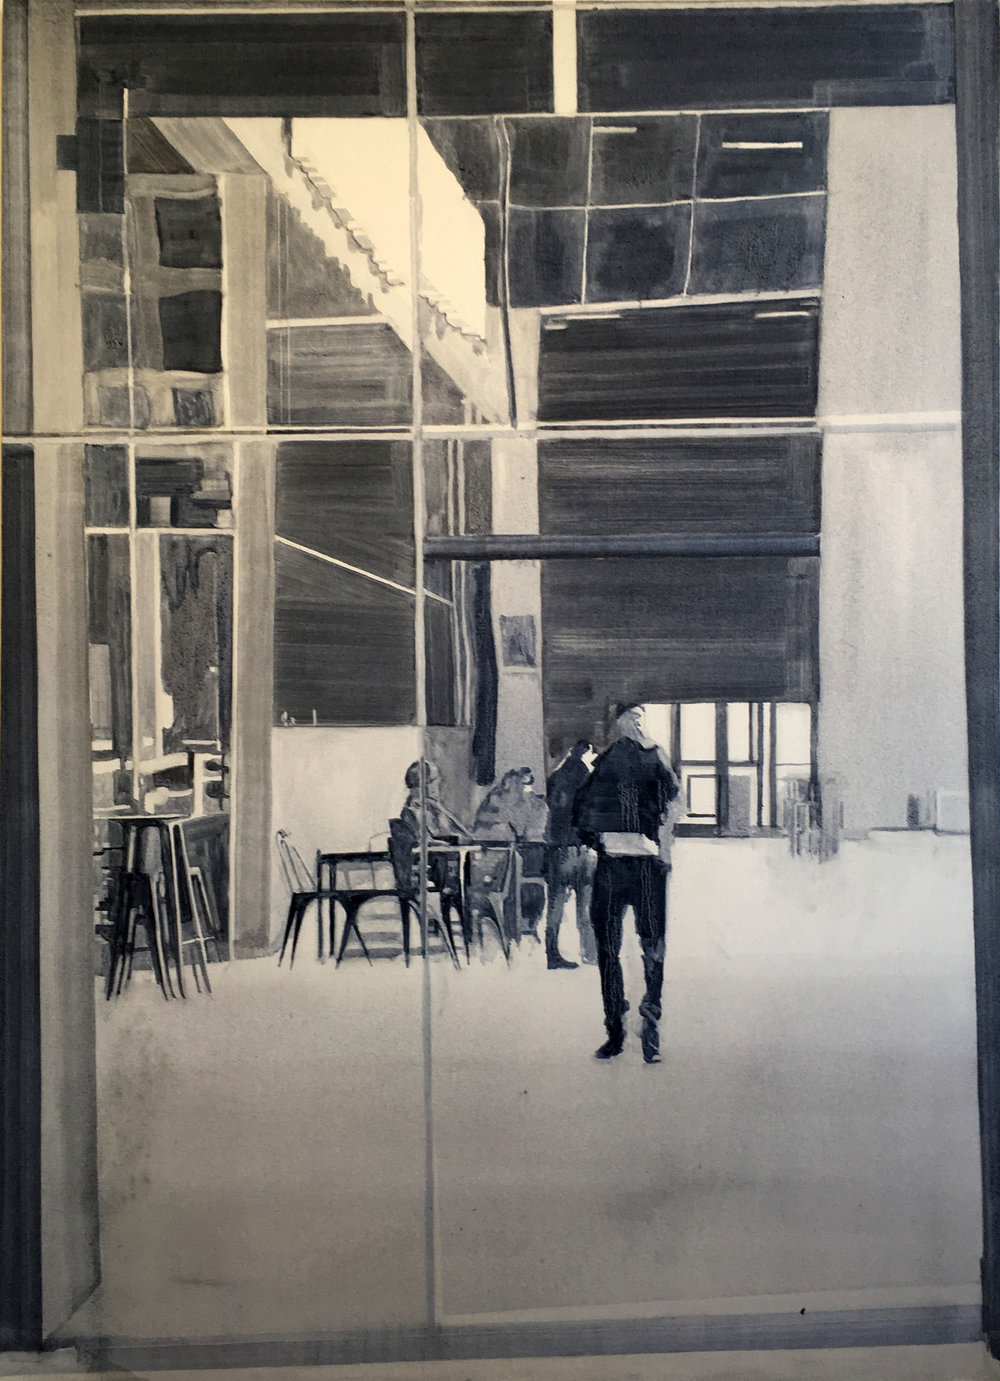 Daniel Nel  Reflection  Oil on canvas  117 x 84 cm